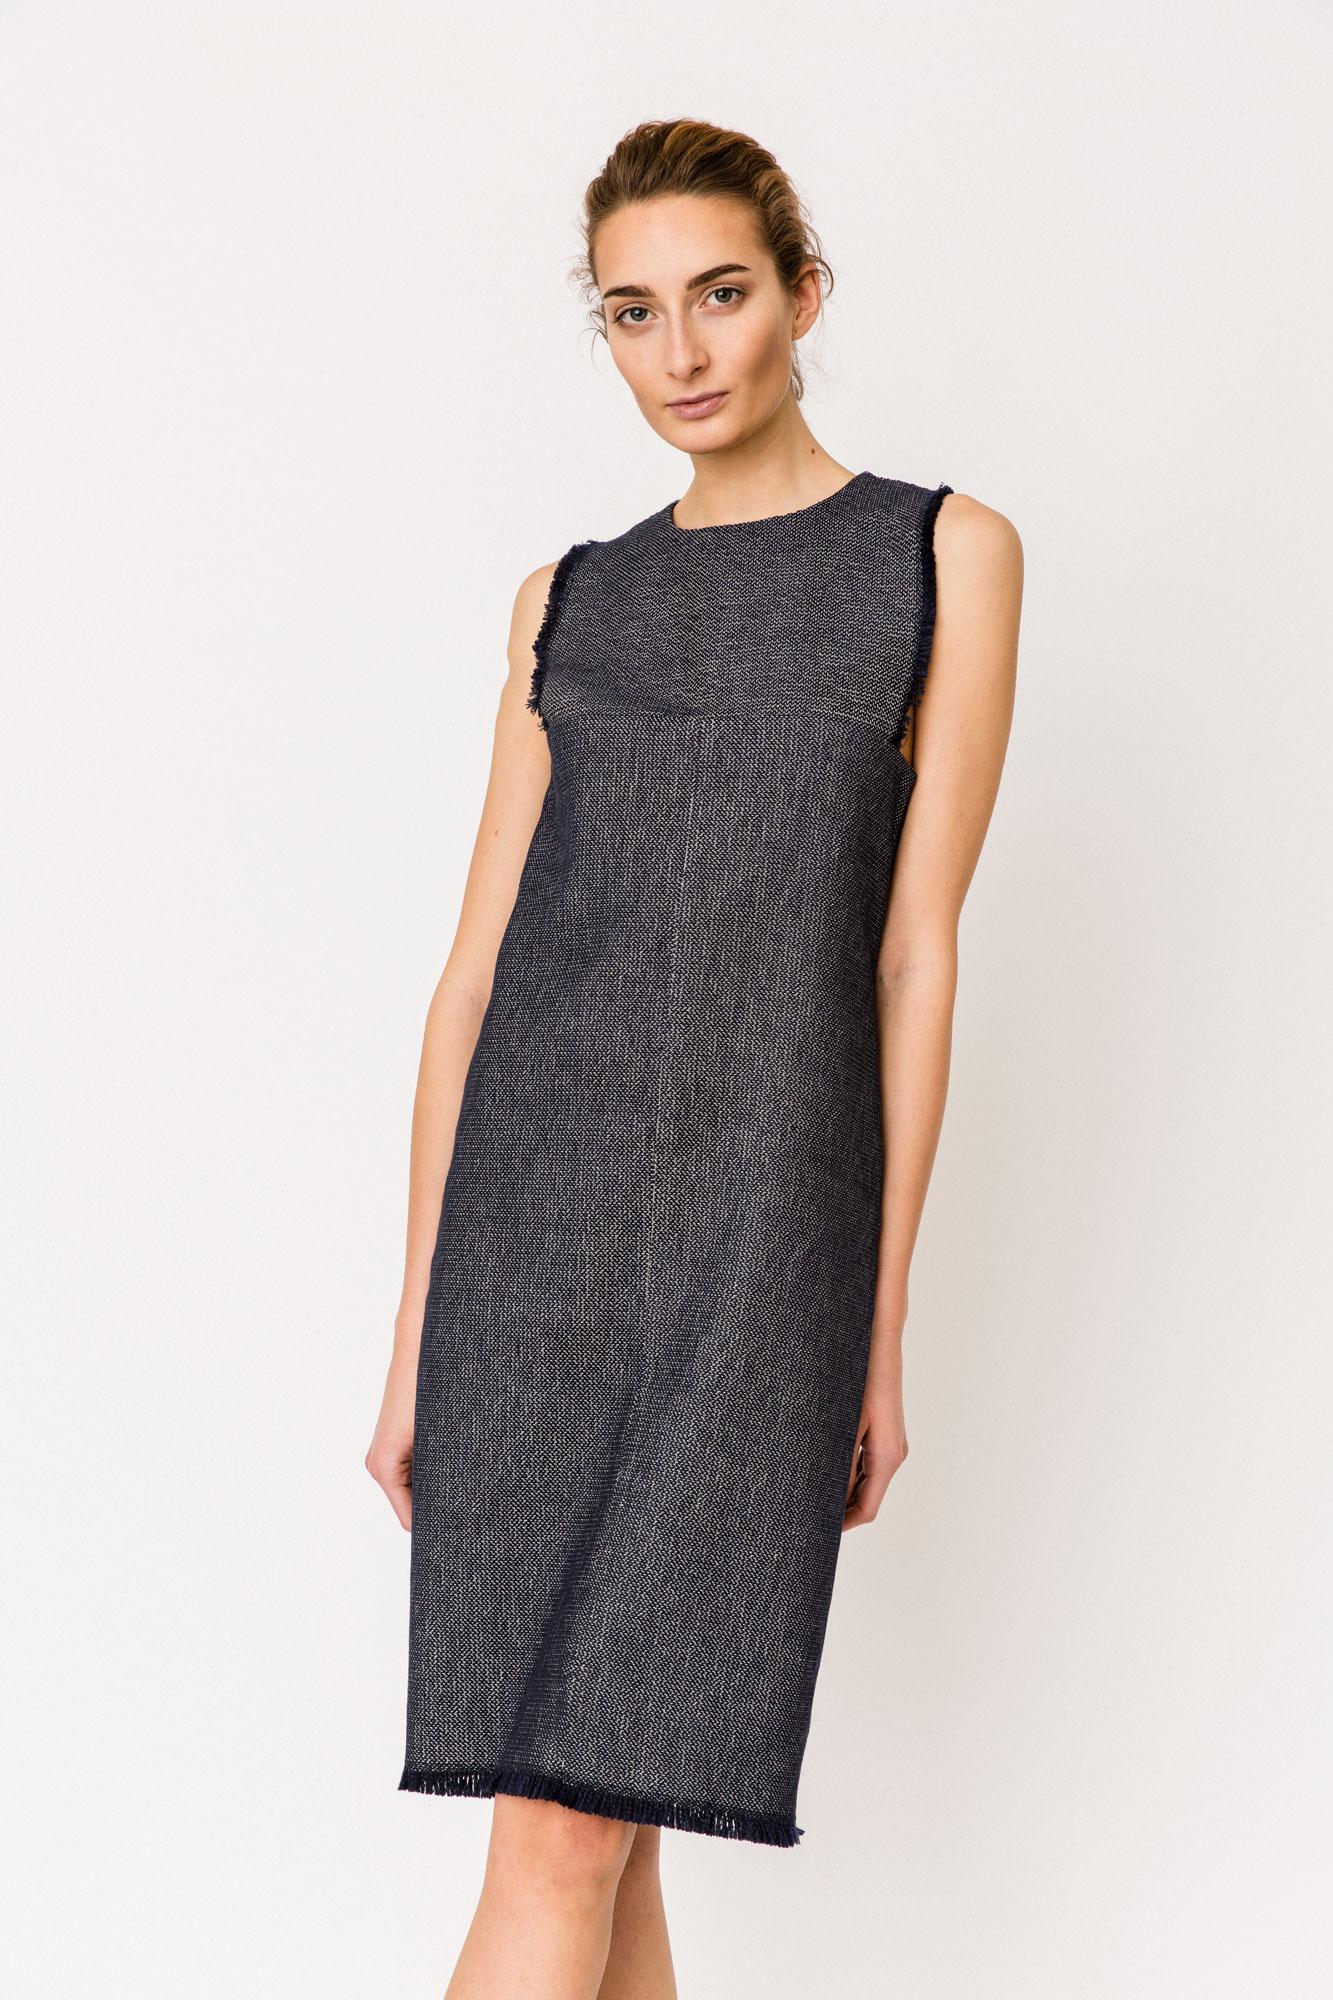 S18-09Plica_Dress1